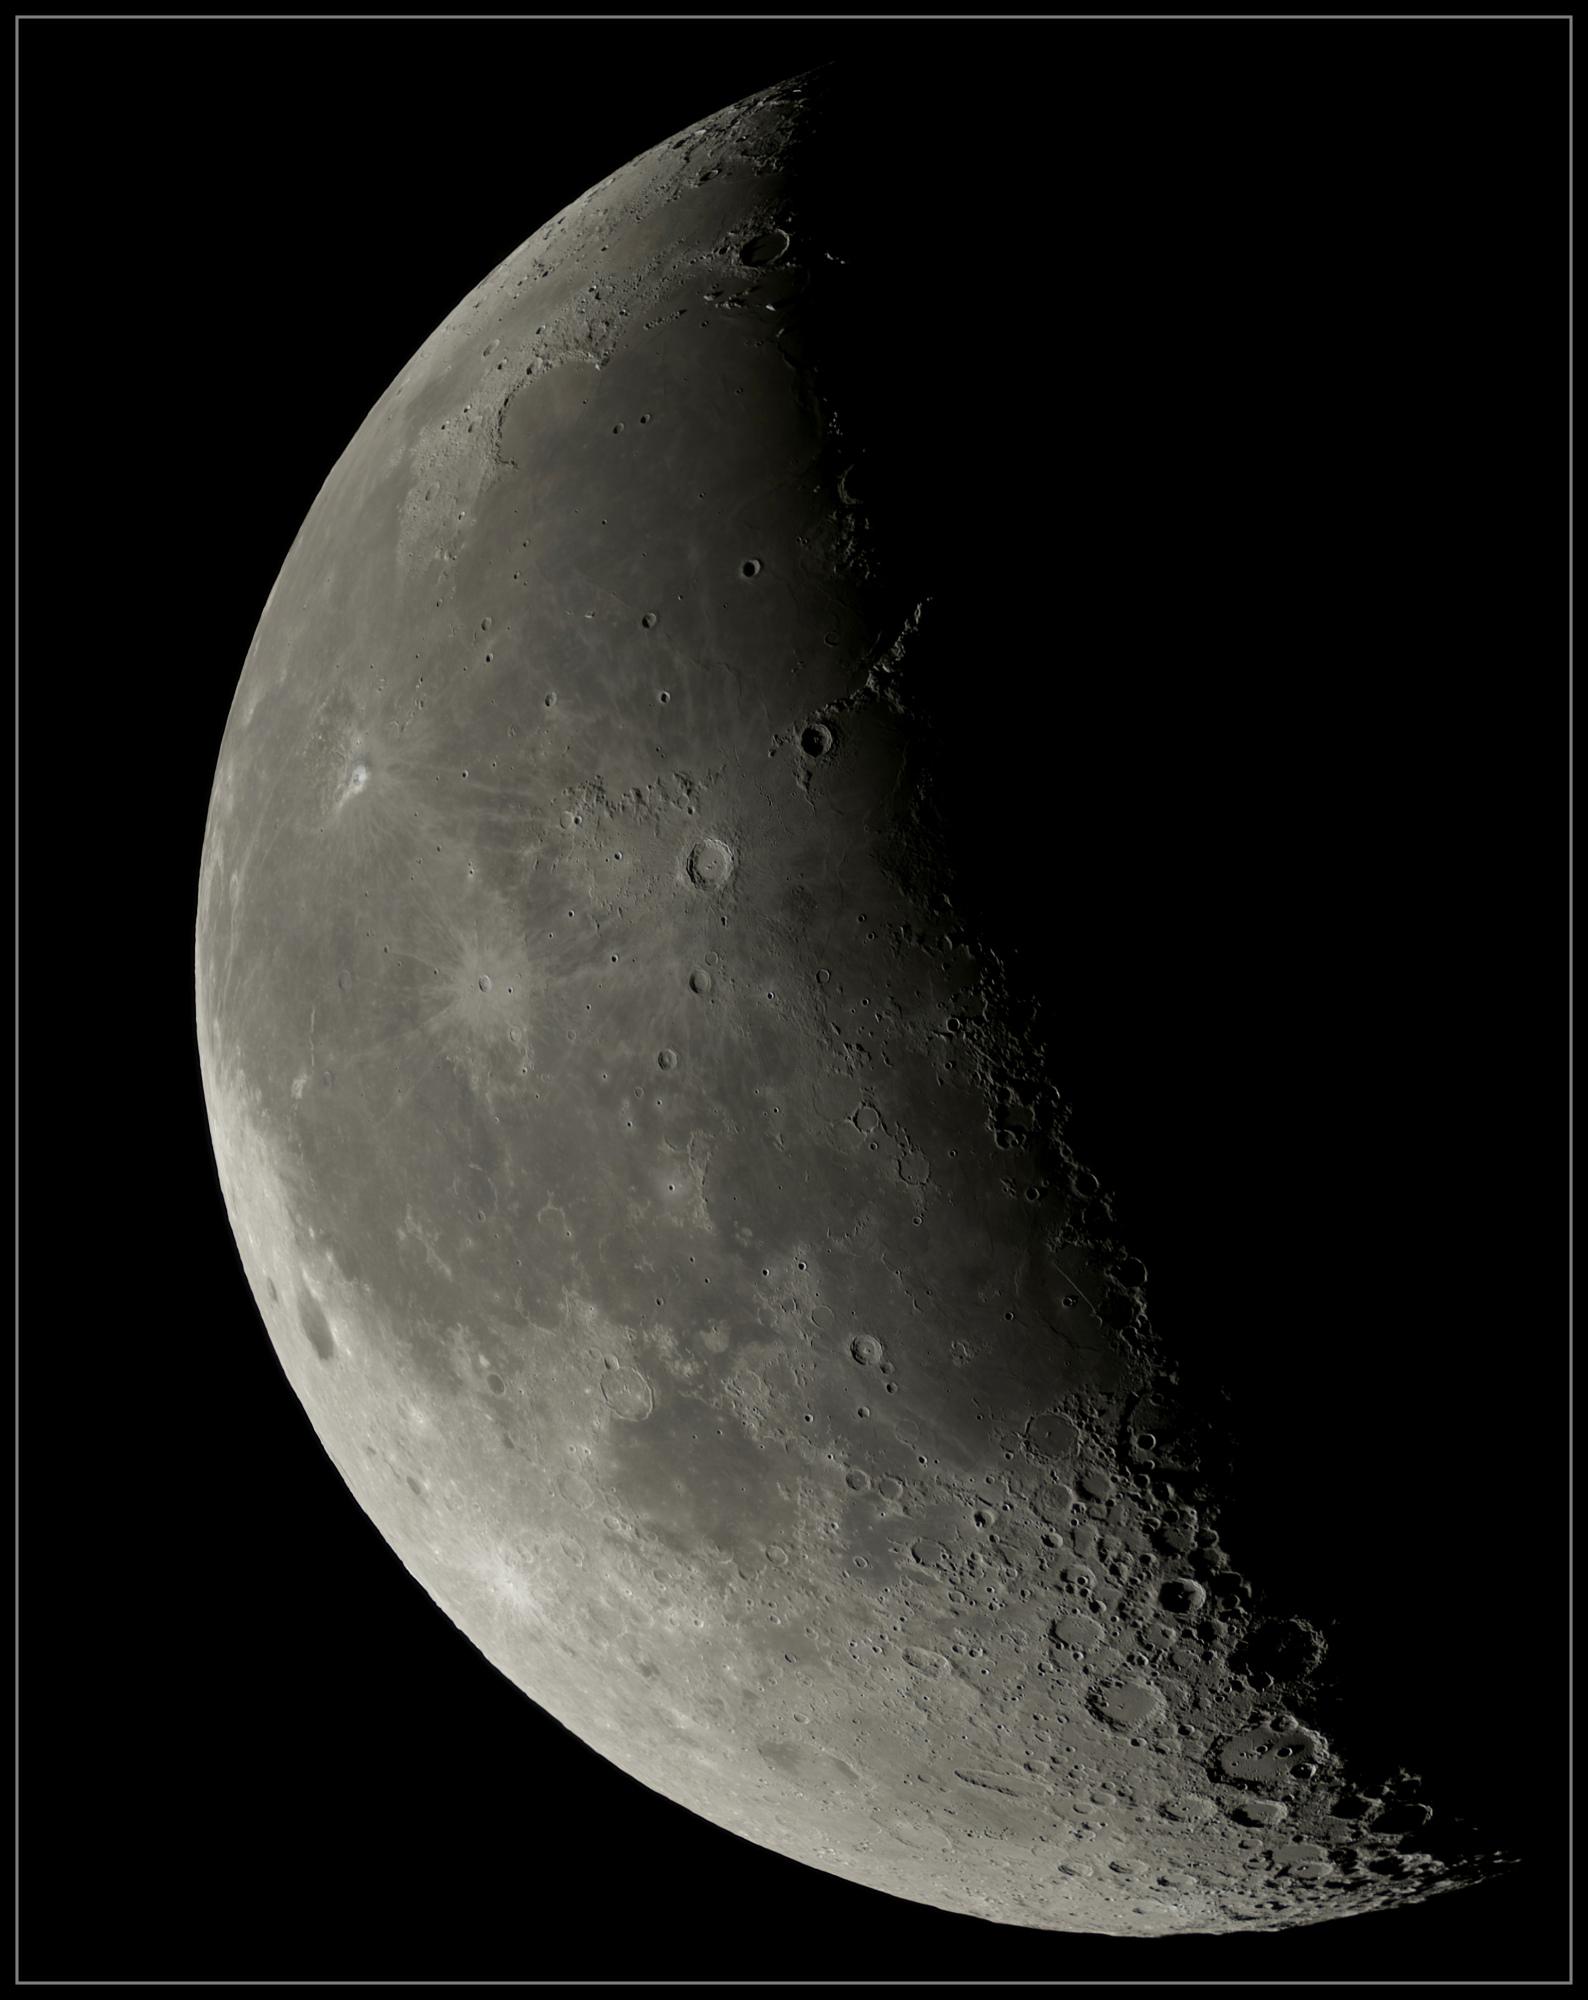 5e2691ca8000f_Moon_072636_180120_ZWOASI224MC_RGB_AS_P30_lapl4_ap202_stitchfinale.thumb.jpg.5e229469e27bad7879674328af42d625.jpg